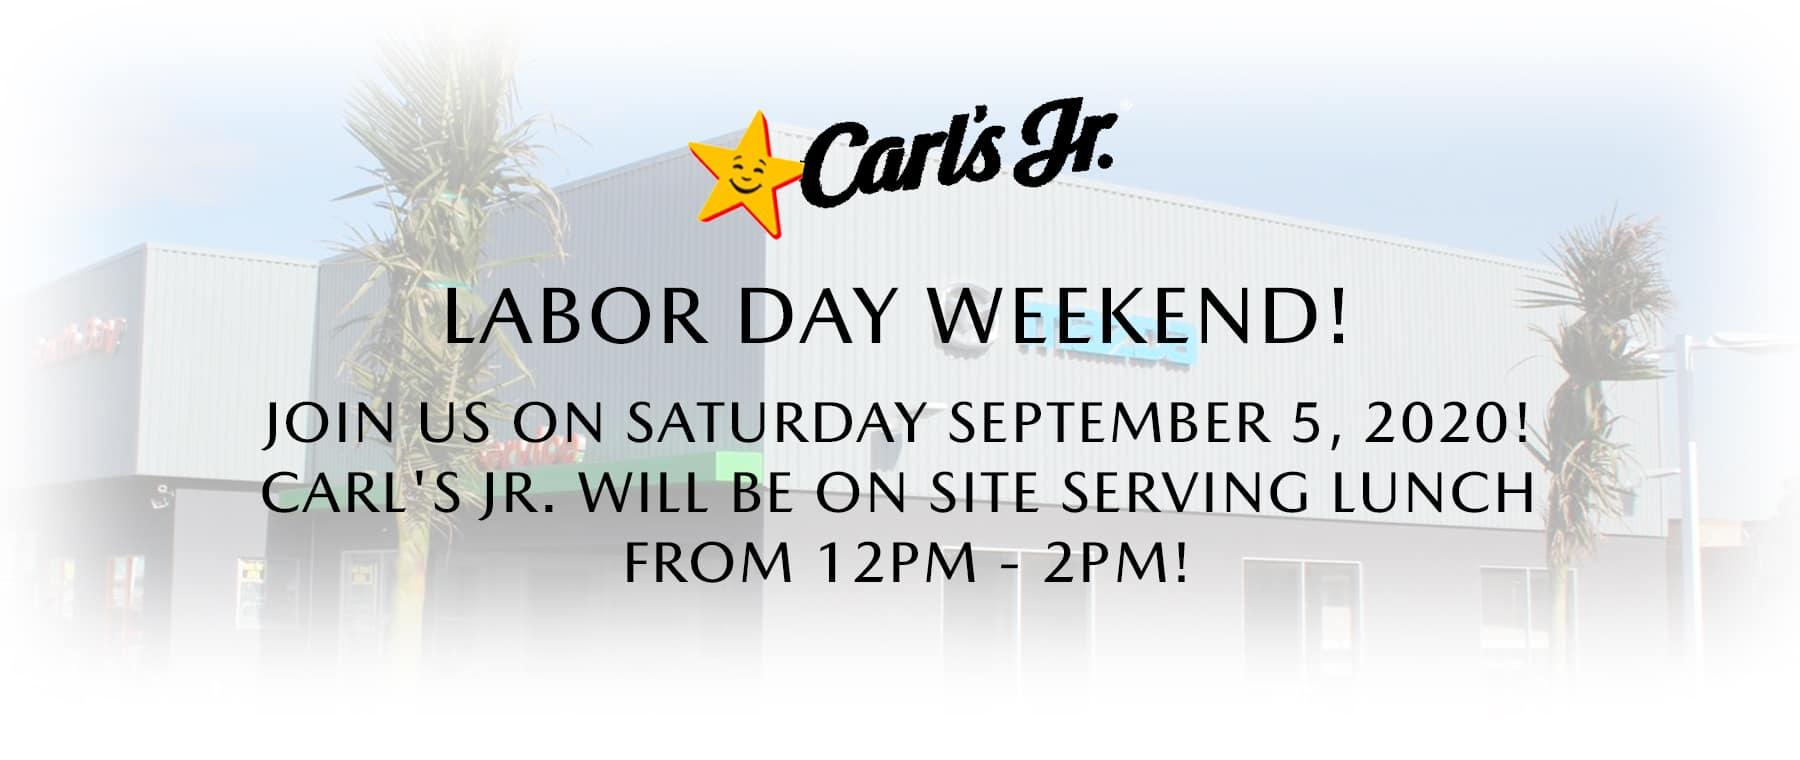 South Bay Mazda Labor Day Weekend